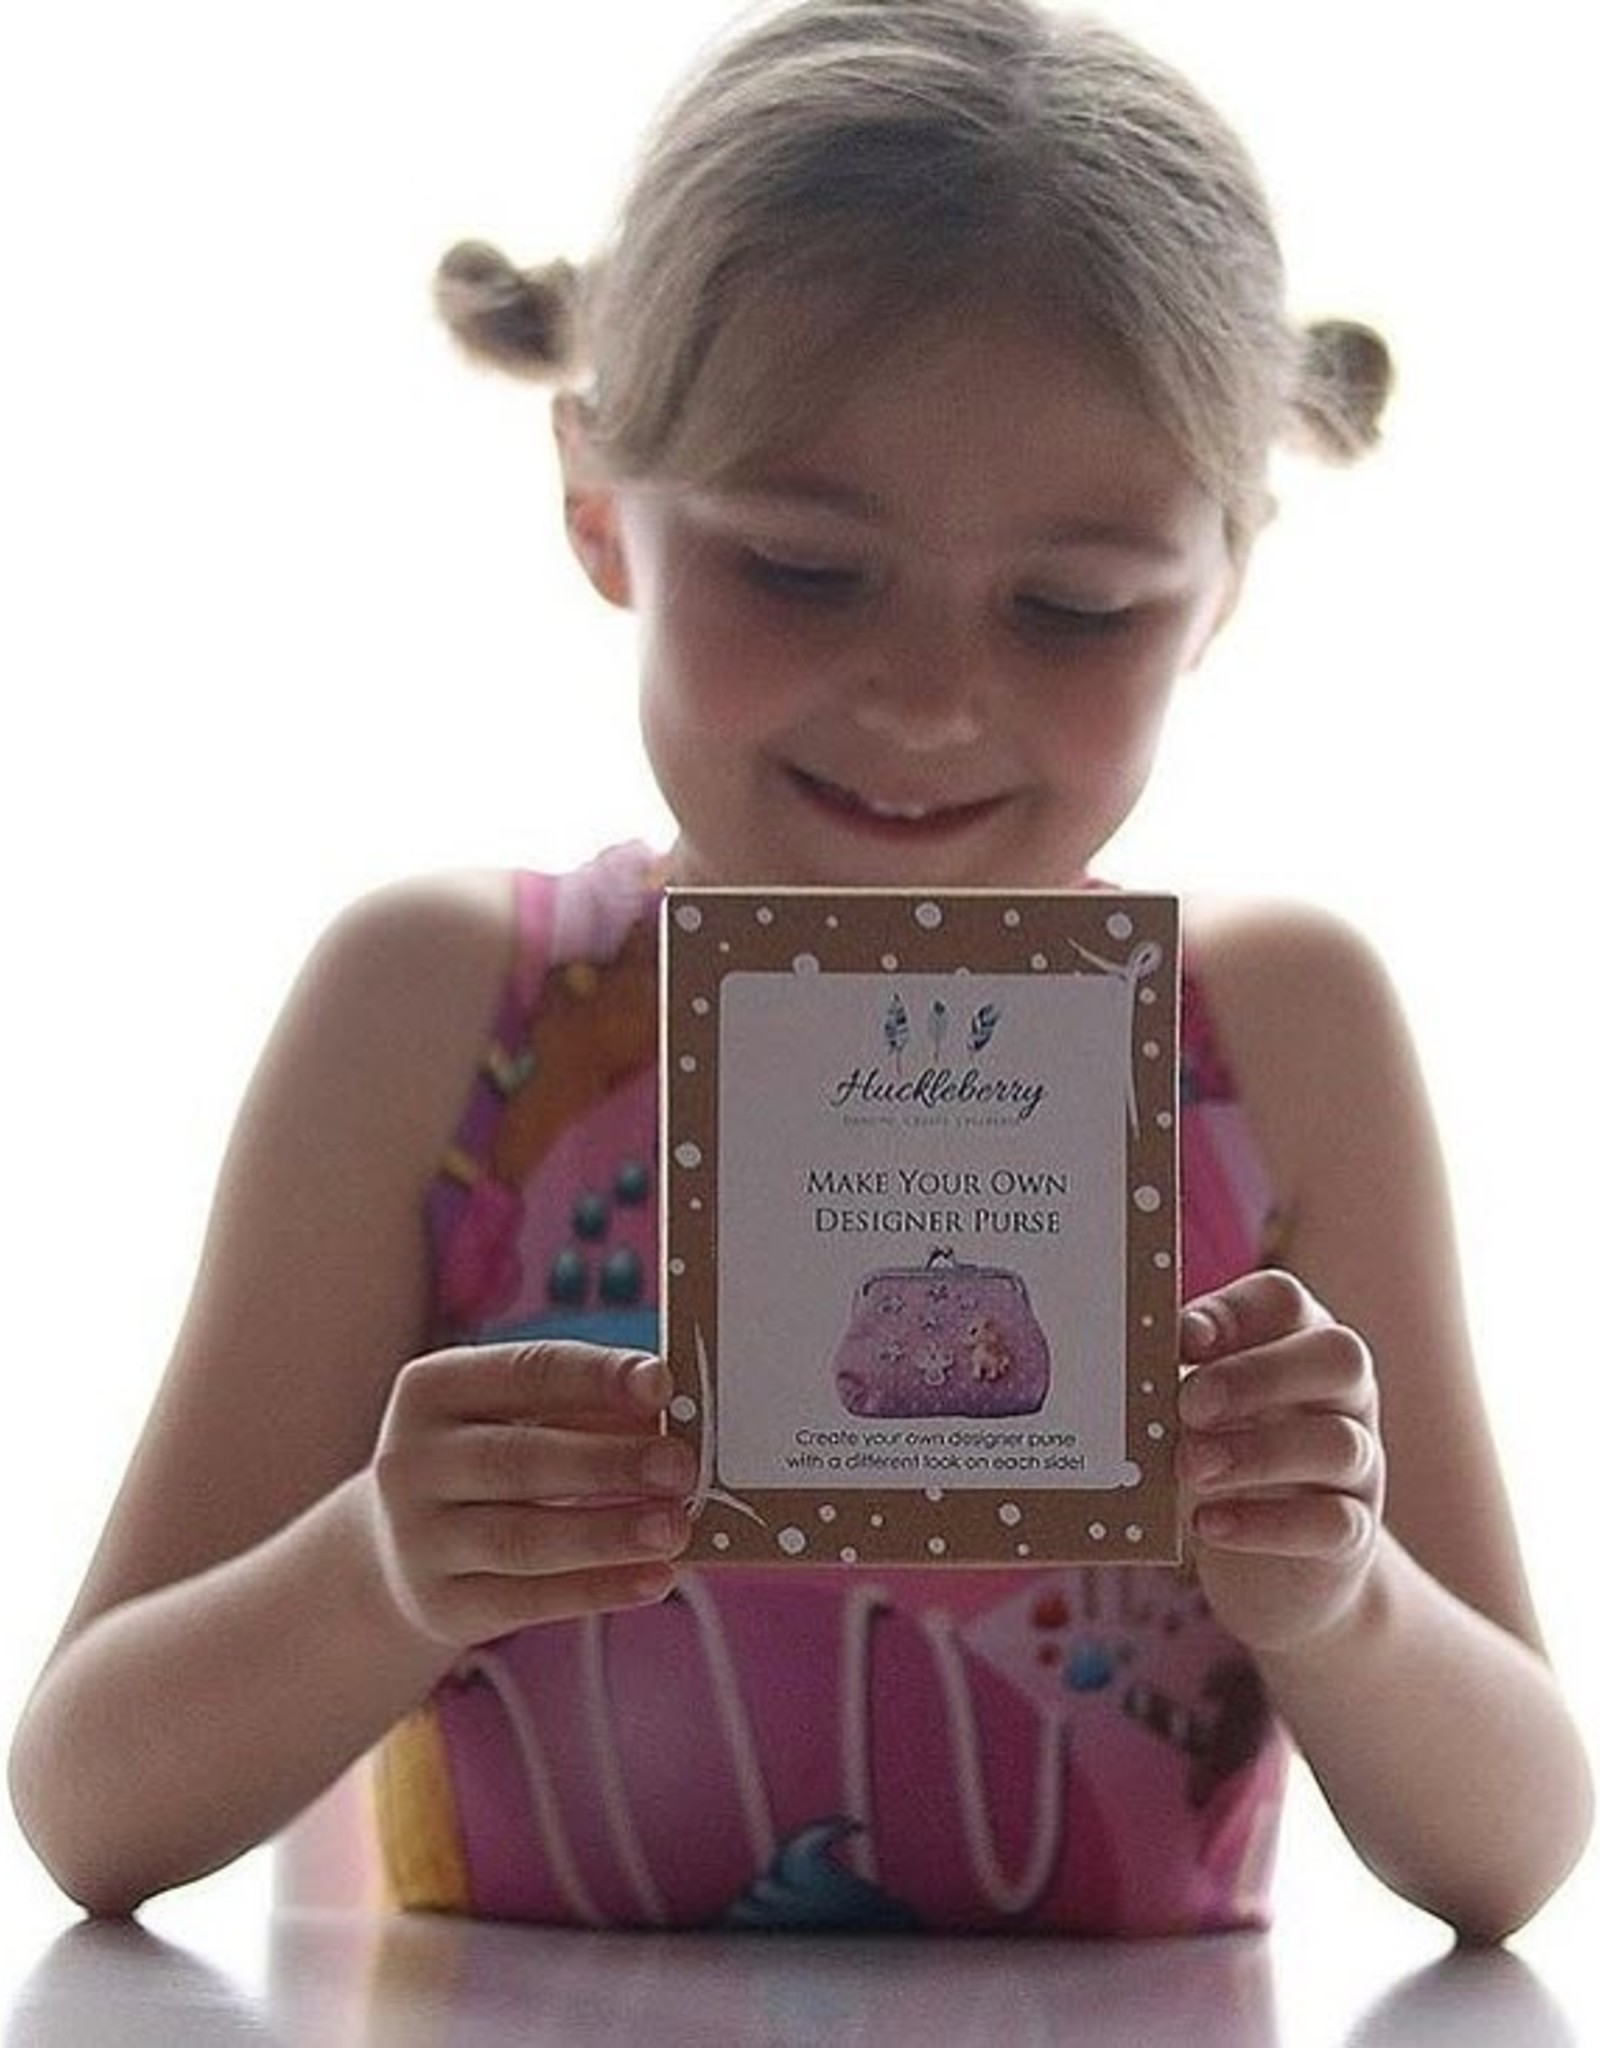 Huckleberry Huckleberry Make Your Own Designer Purse - Unicorns & Rainbow Pink